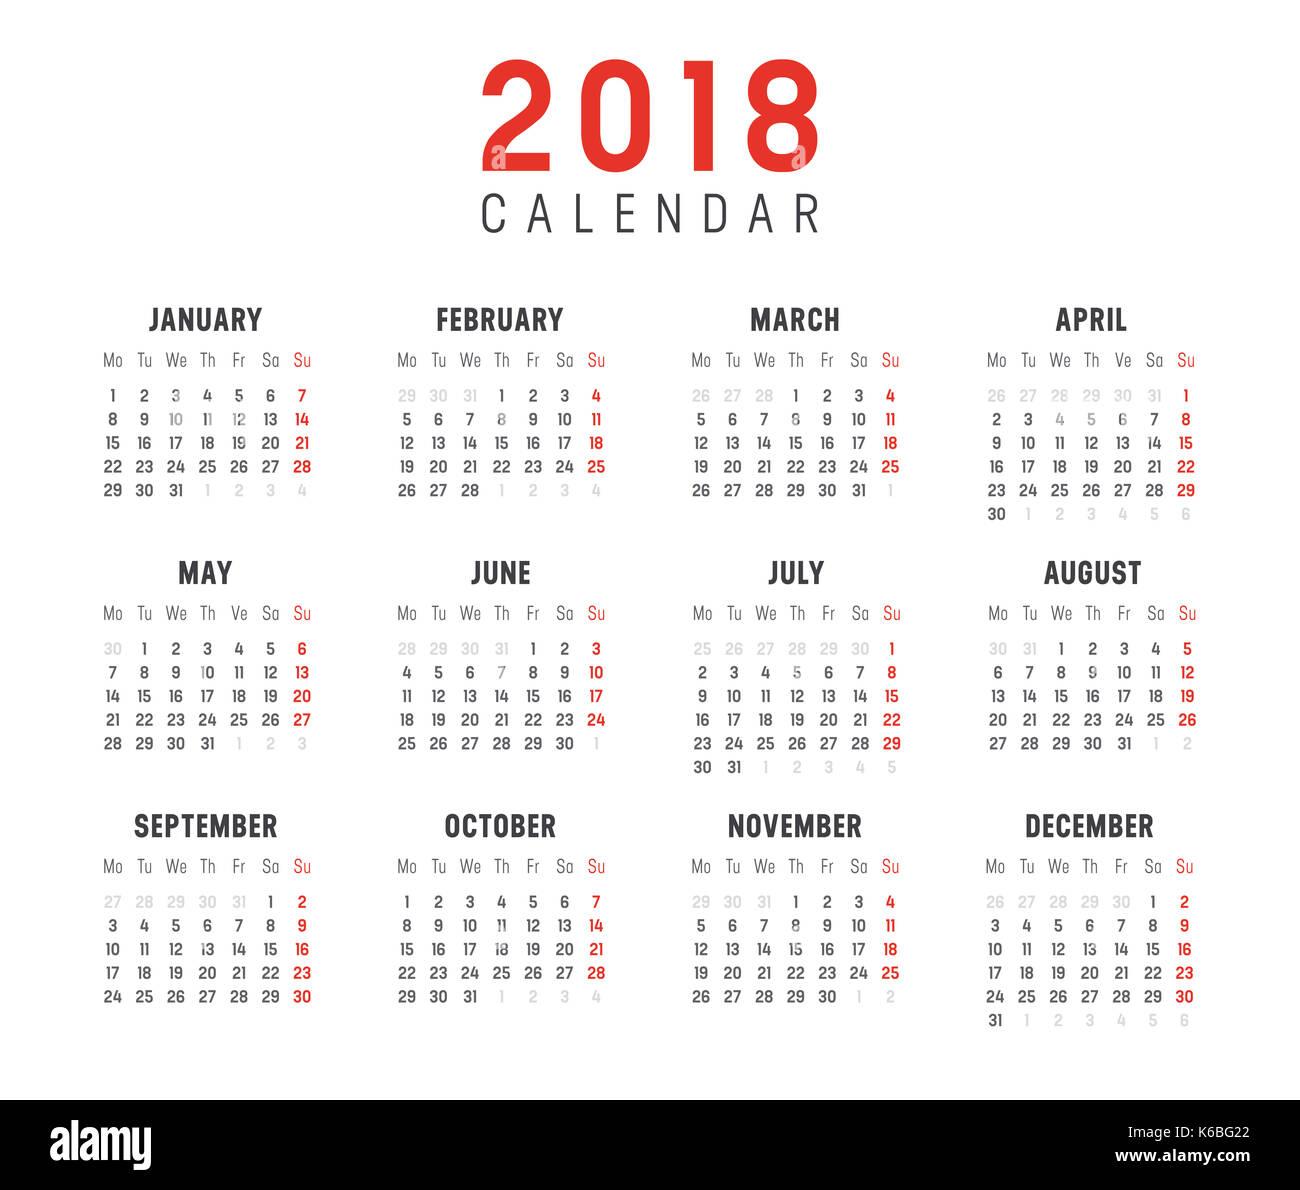 February 2018 Calendar Vintage : Calendar stock photos images